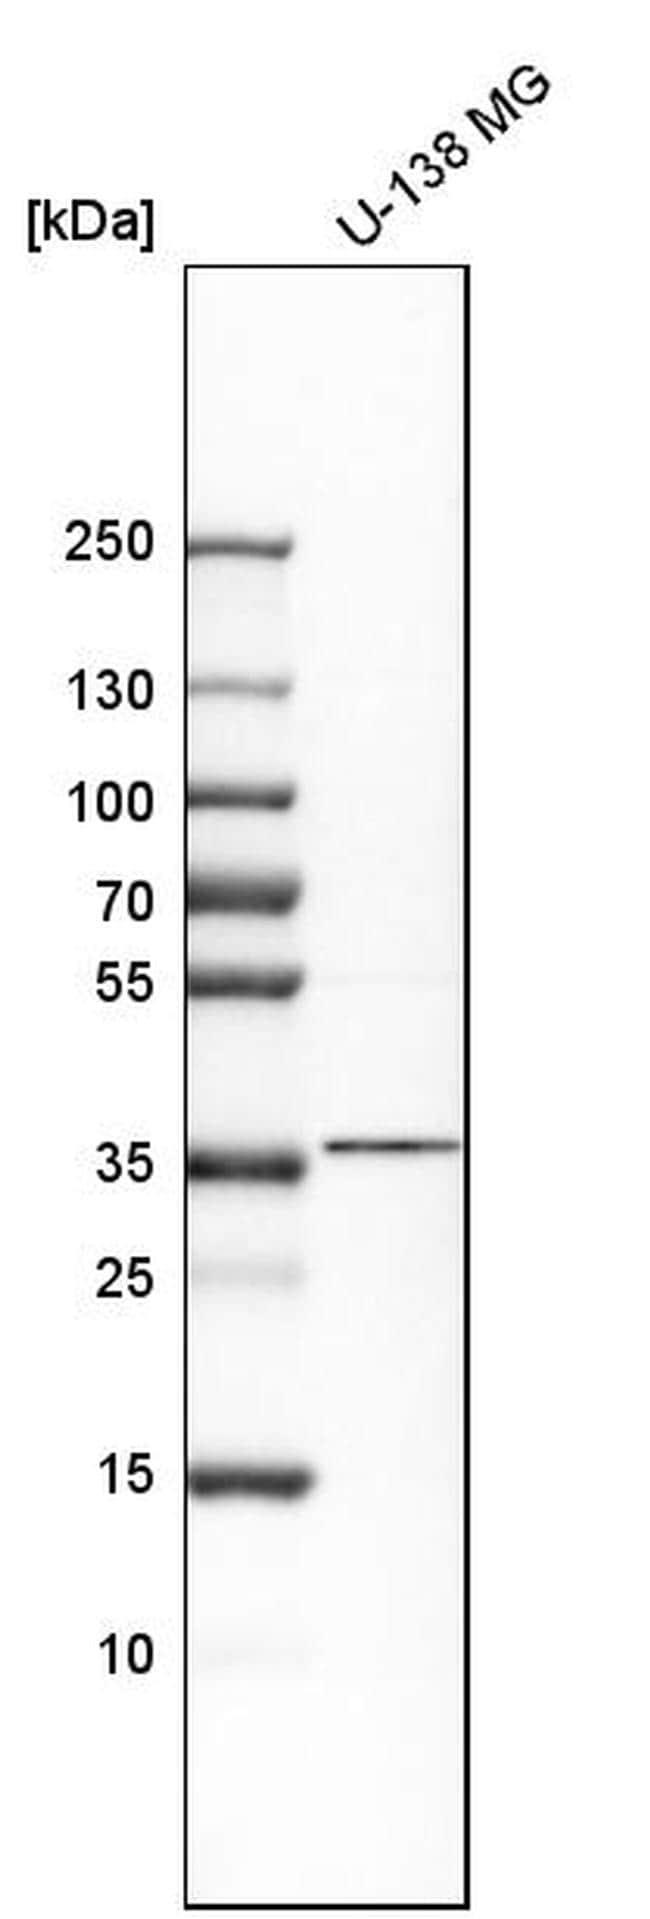 Nkx2.2 Antibody in Western Blot (WB)